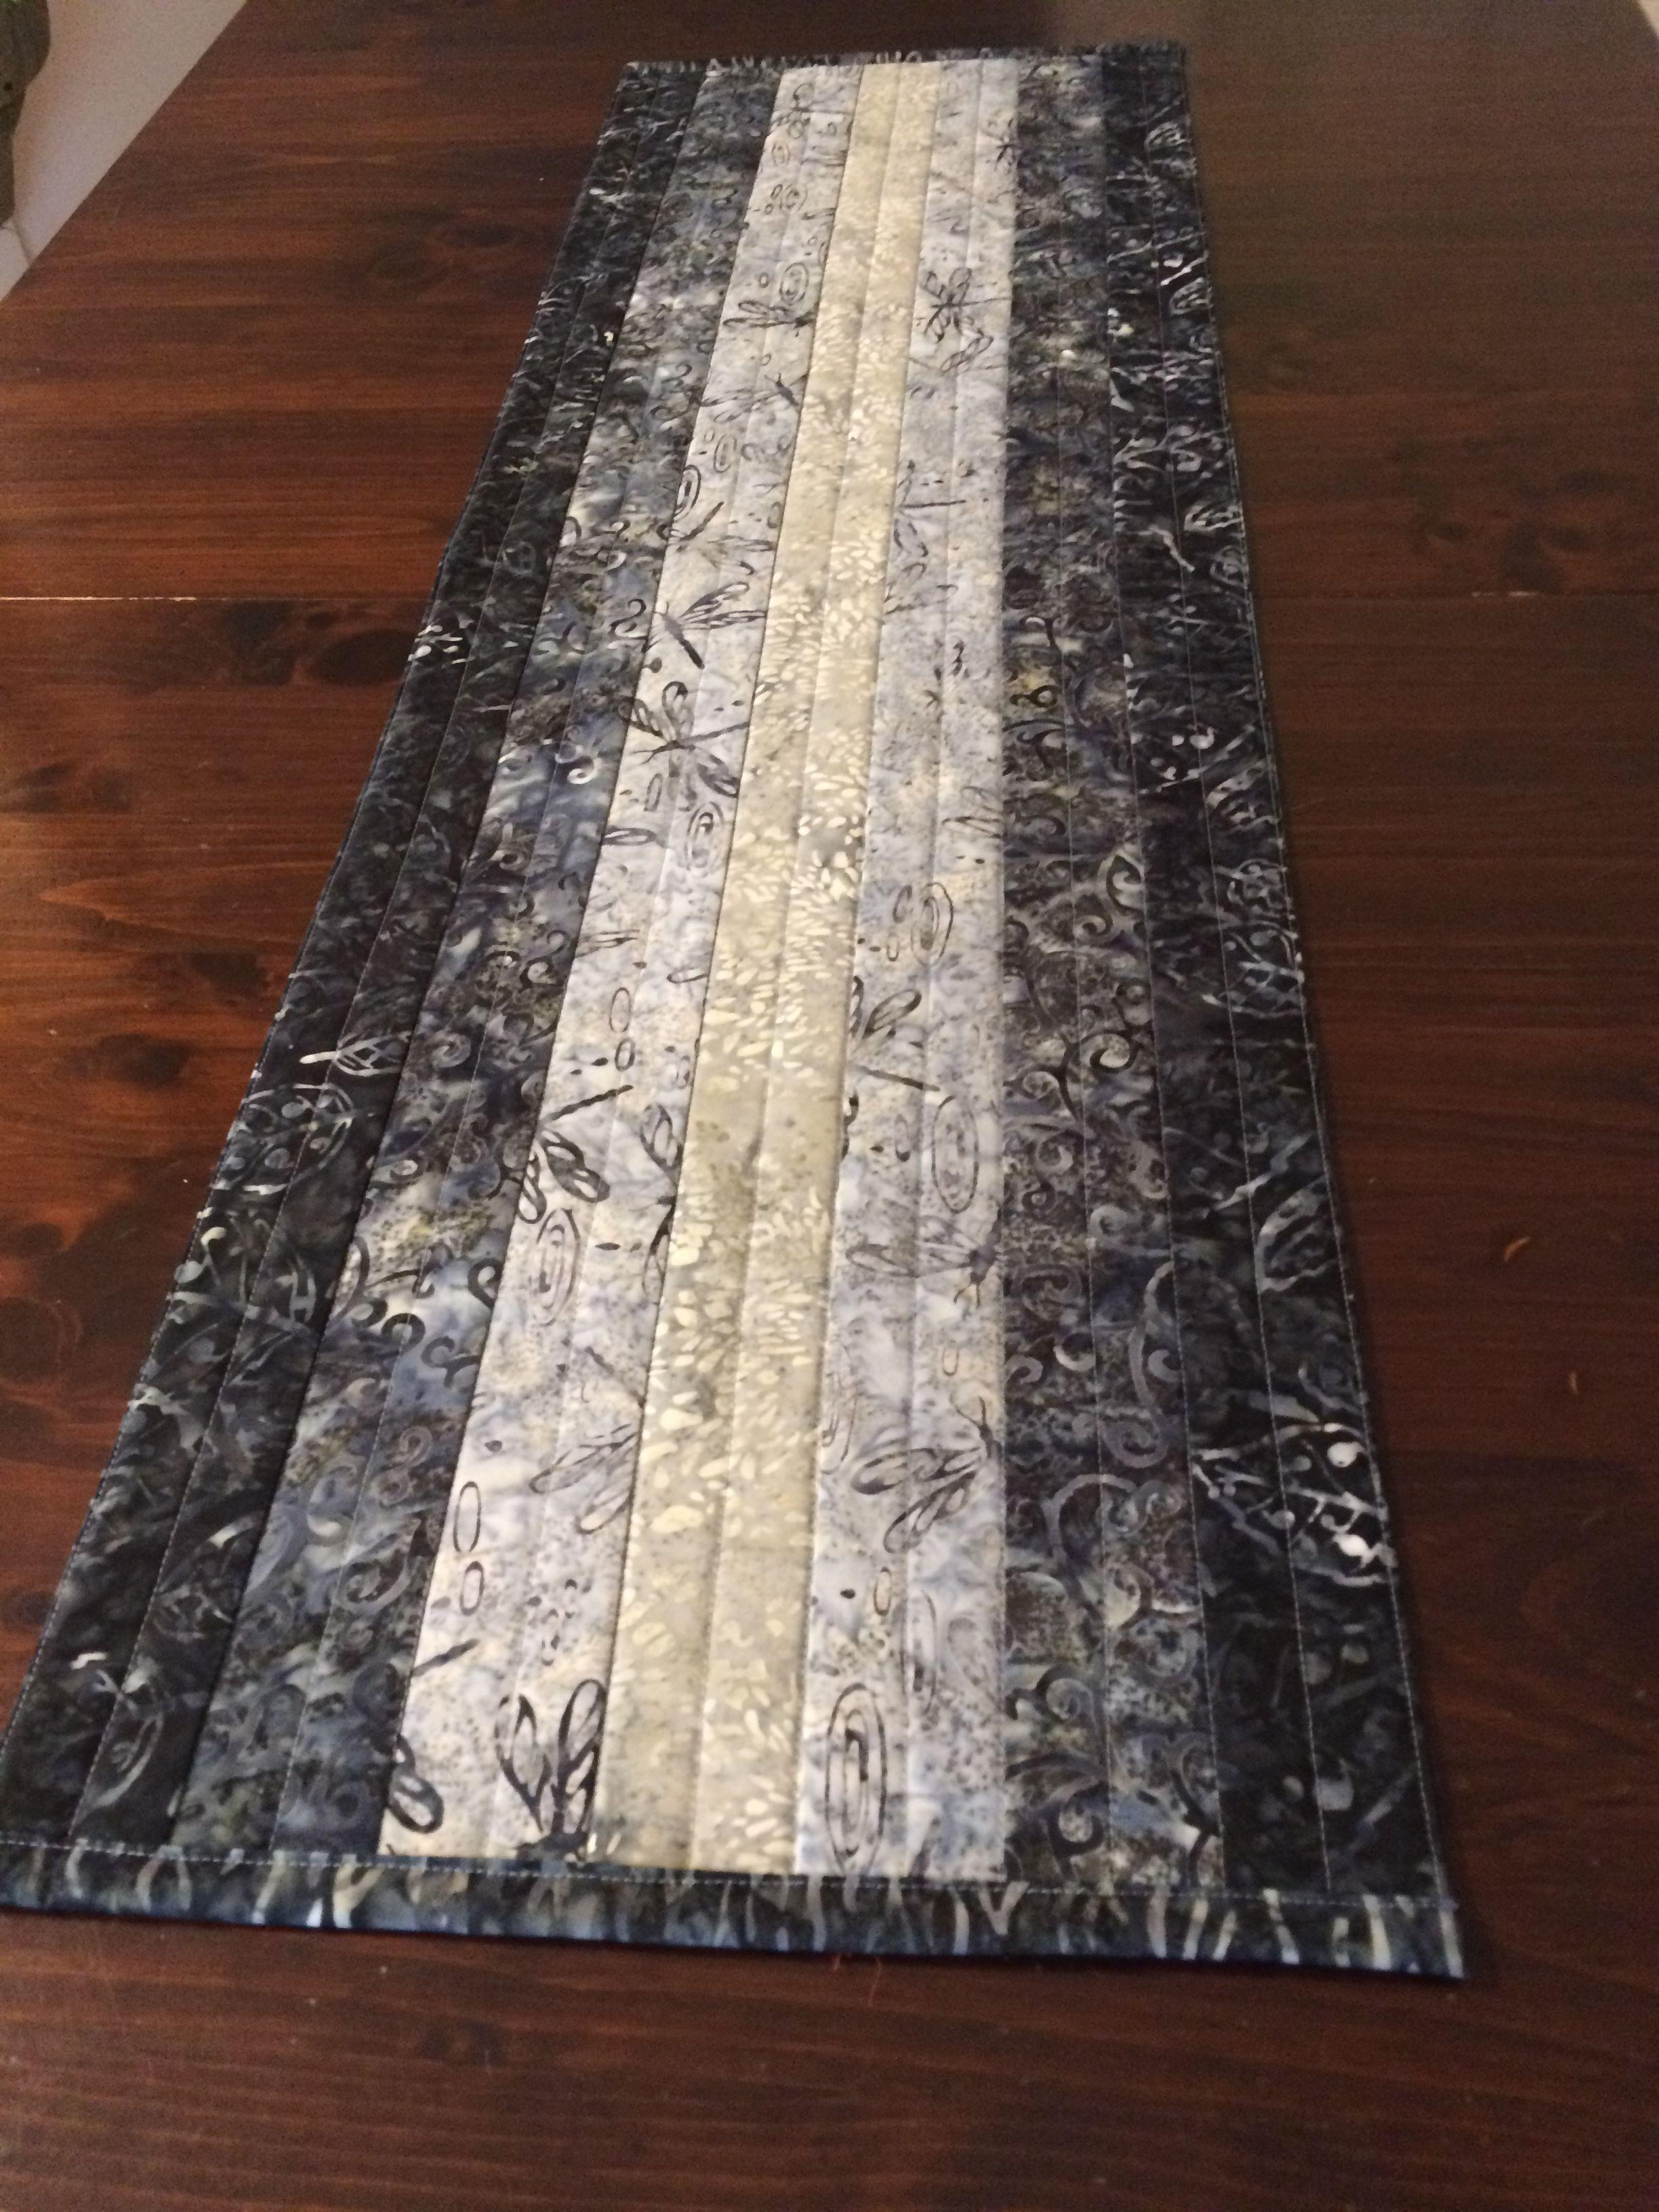 Gray /& Teal Batik Table or Bed Runner Handmade Reversible Table Quilt Quilted Batik Tablerunner Moroccan Motif Tablerunner Dining Decor